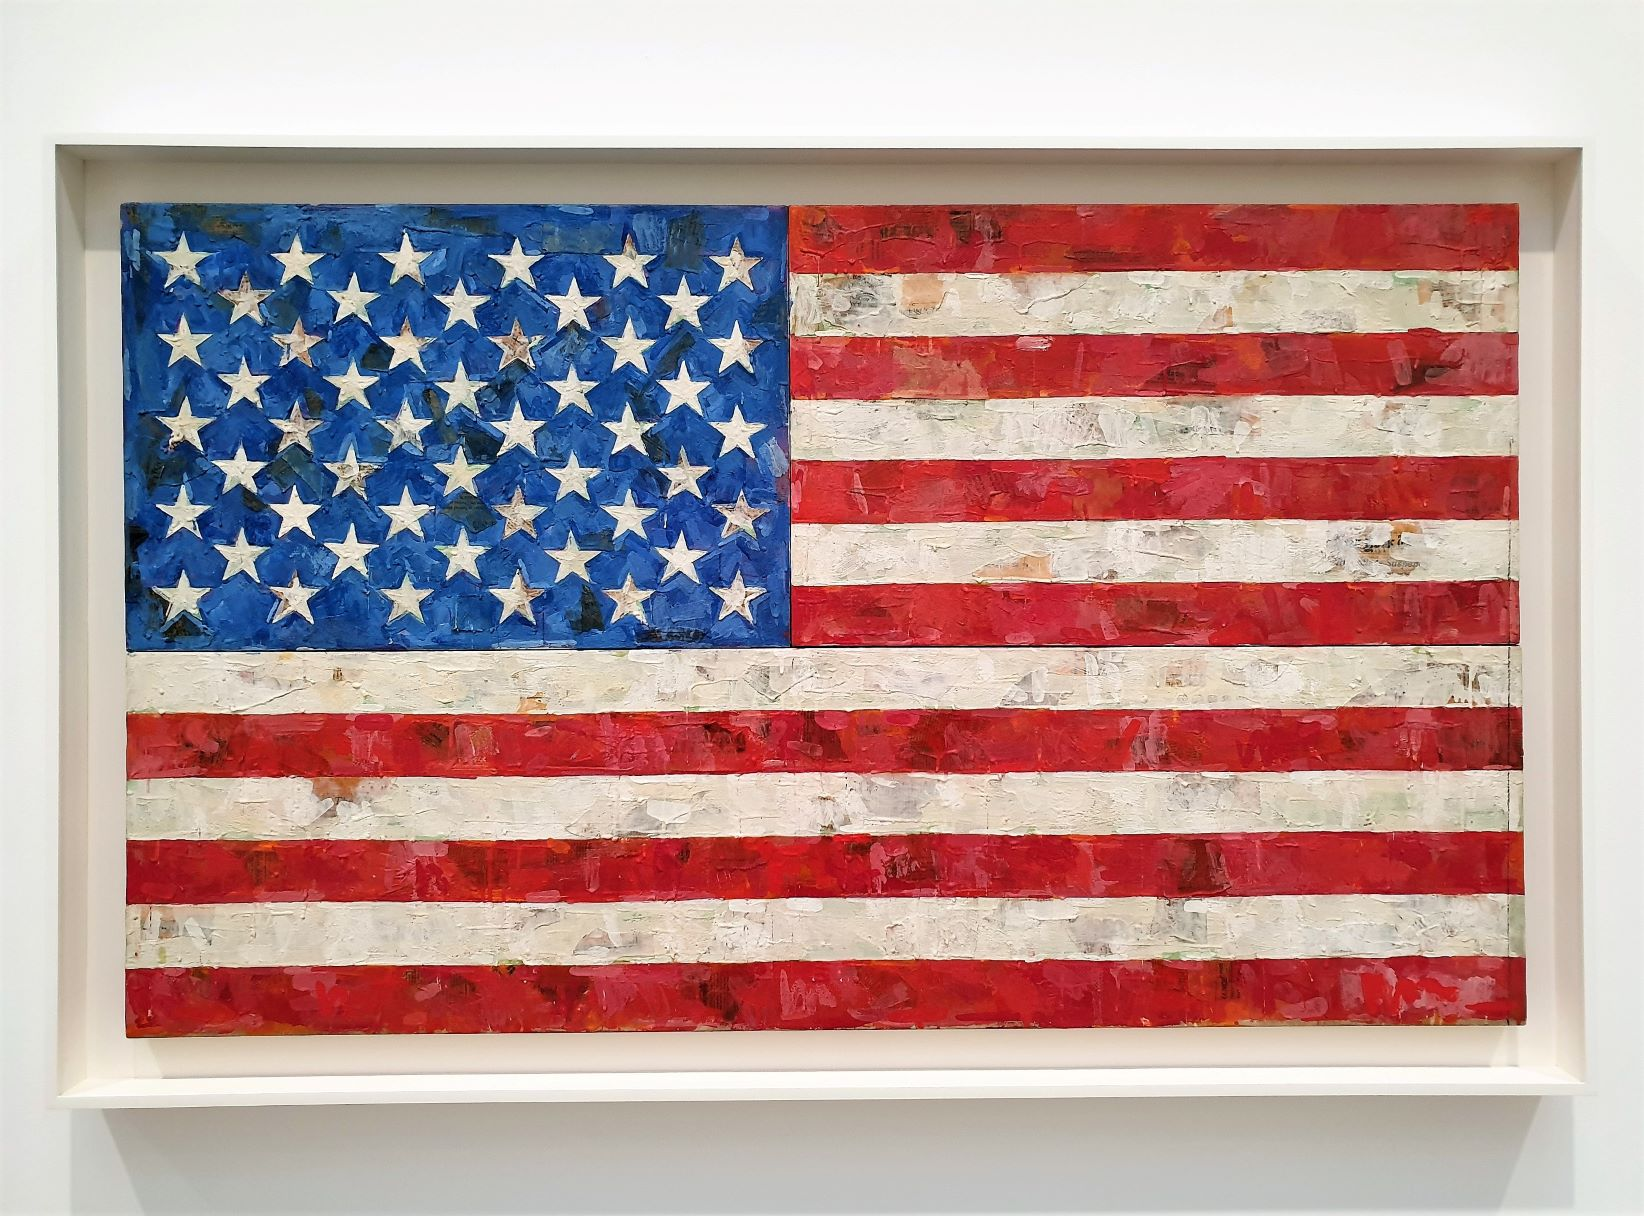 Jasper Johns al The Broad